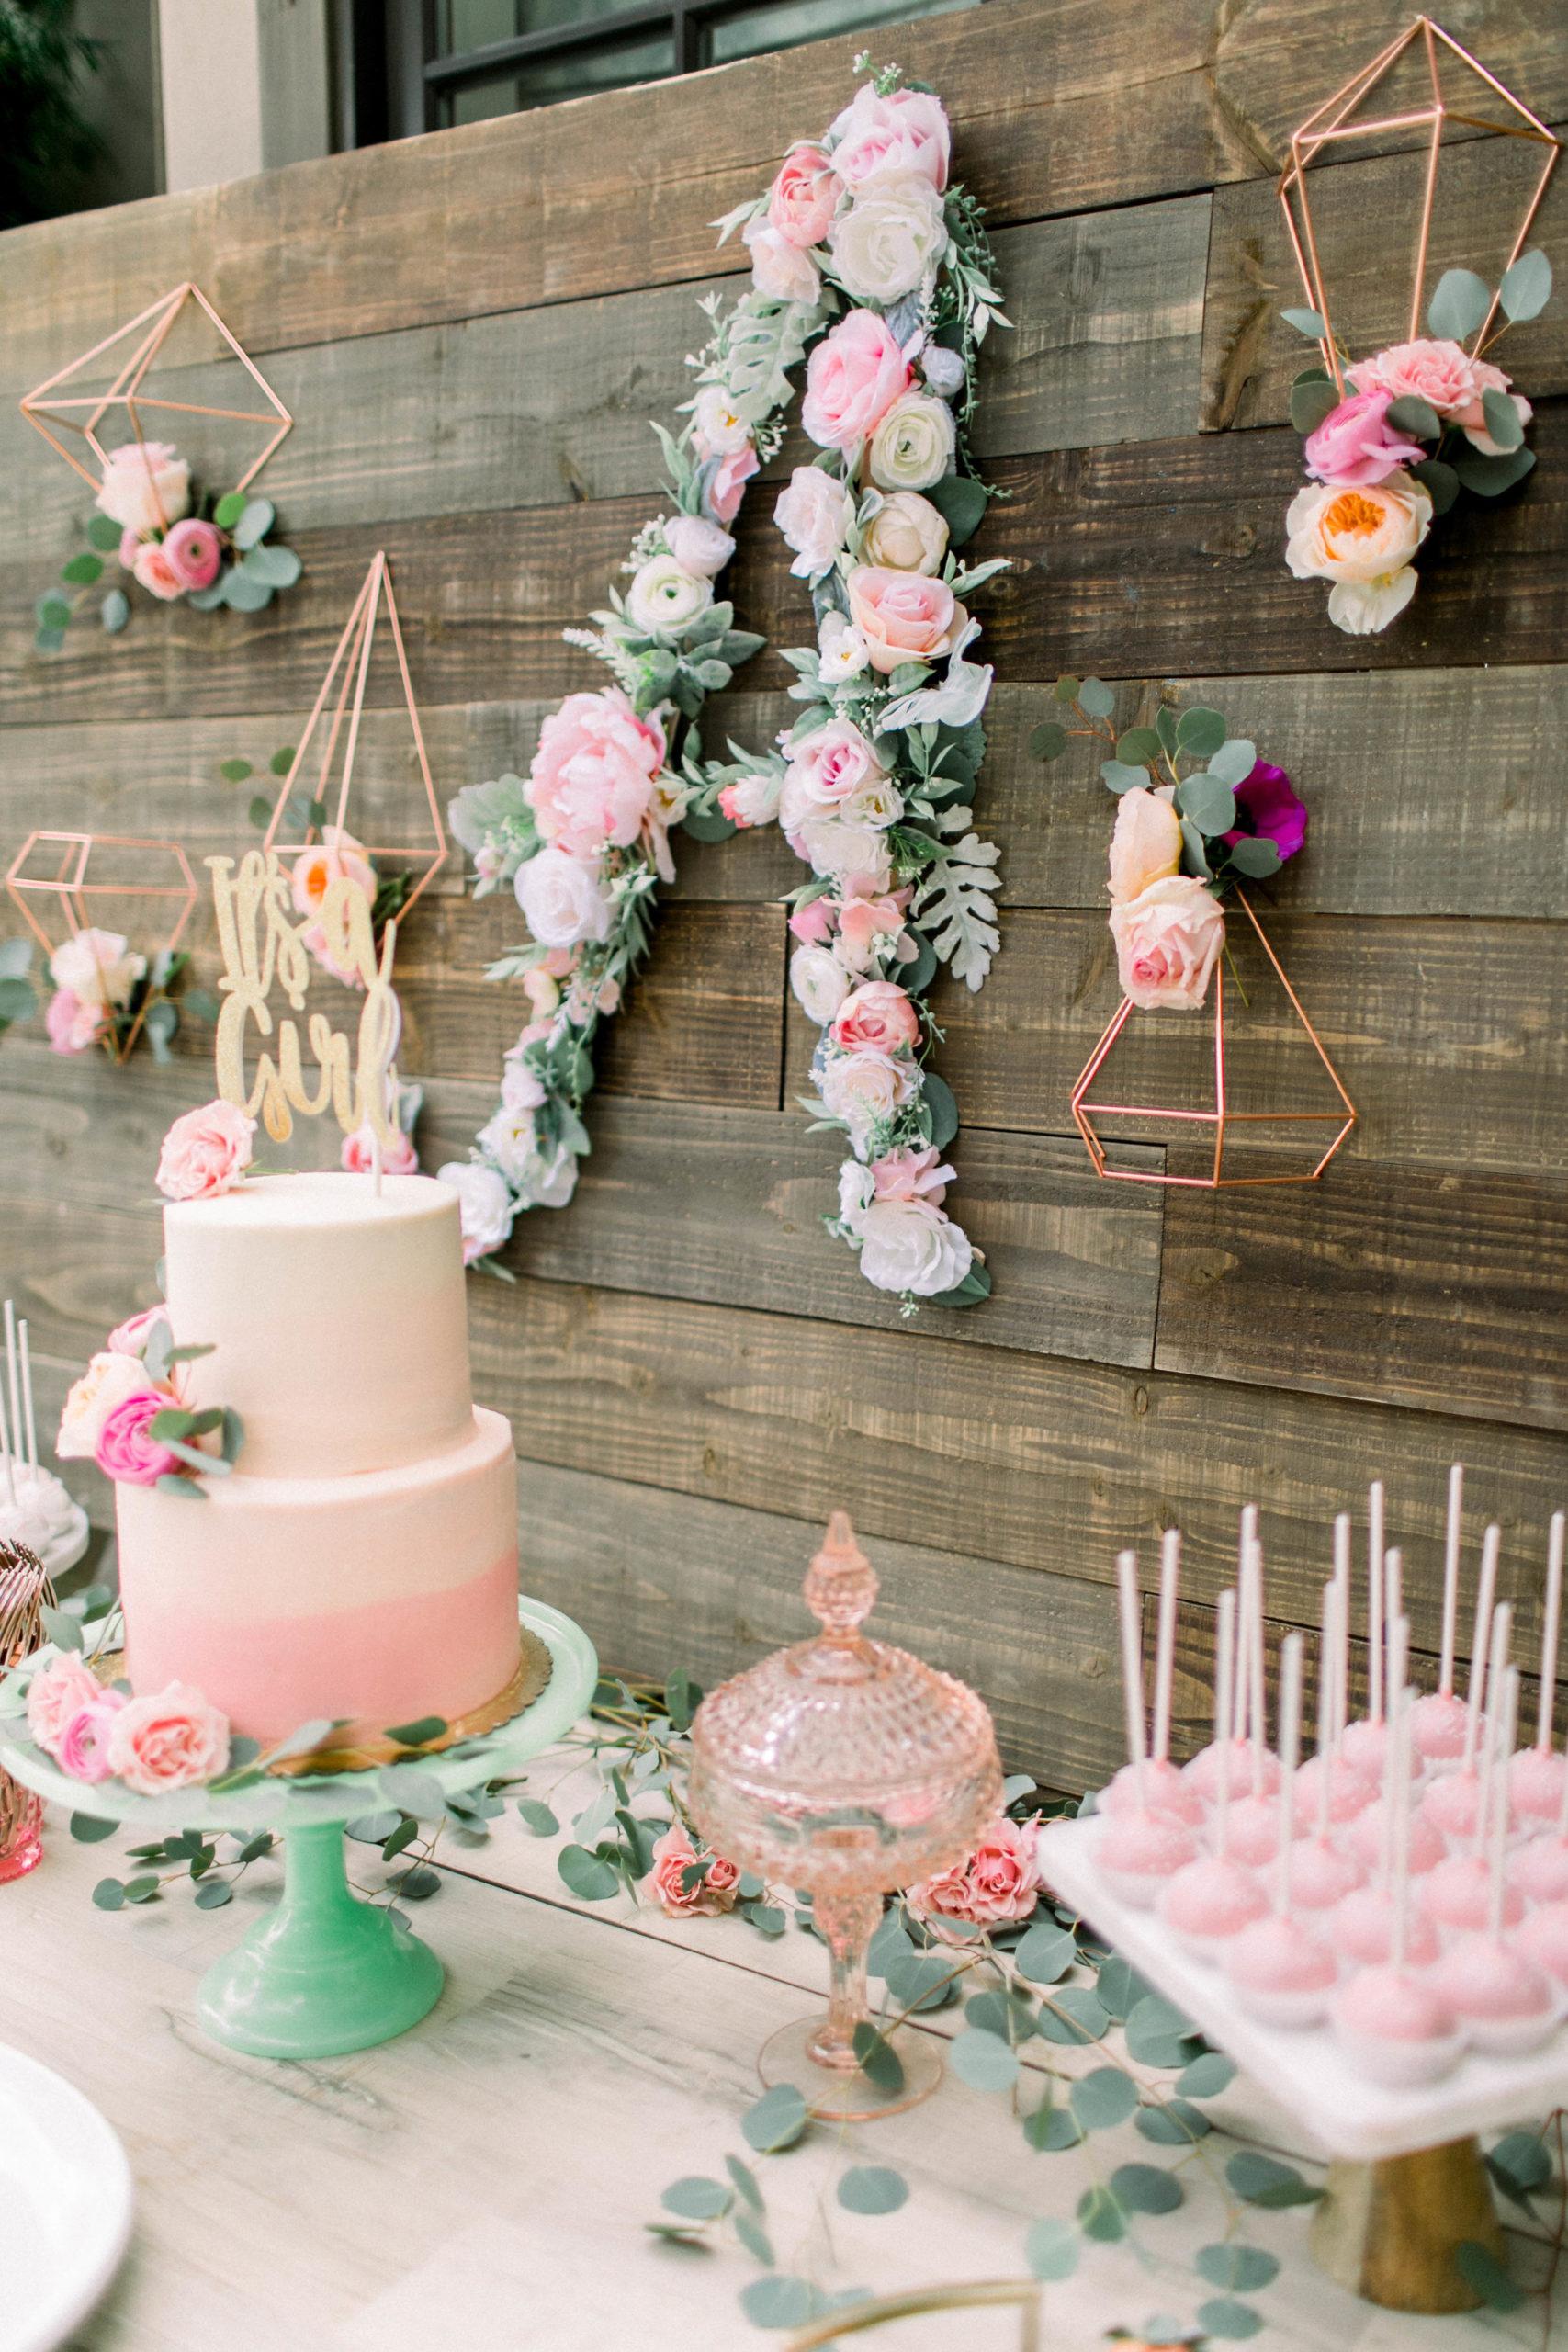 Baby Shower Dessert Table : shower, dessert, table, Beautiful, Shower, Dessert, Tables, Recreate